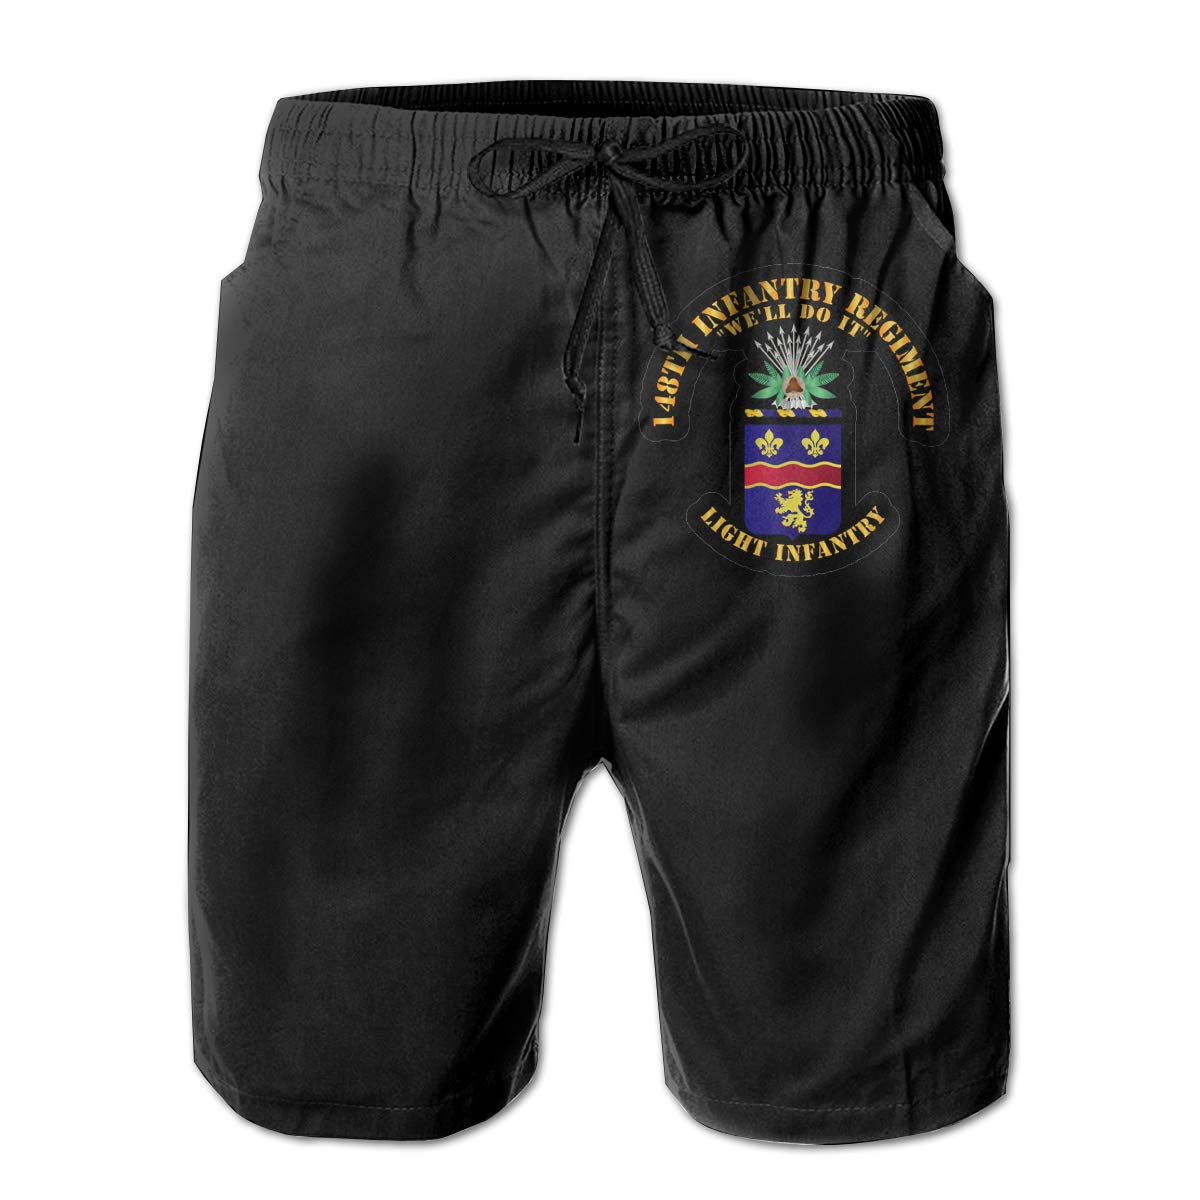 148th Infantry Regiment 3D Print Mens Beach Shorts Swim Trunks Workout Shorts Summer Shorts